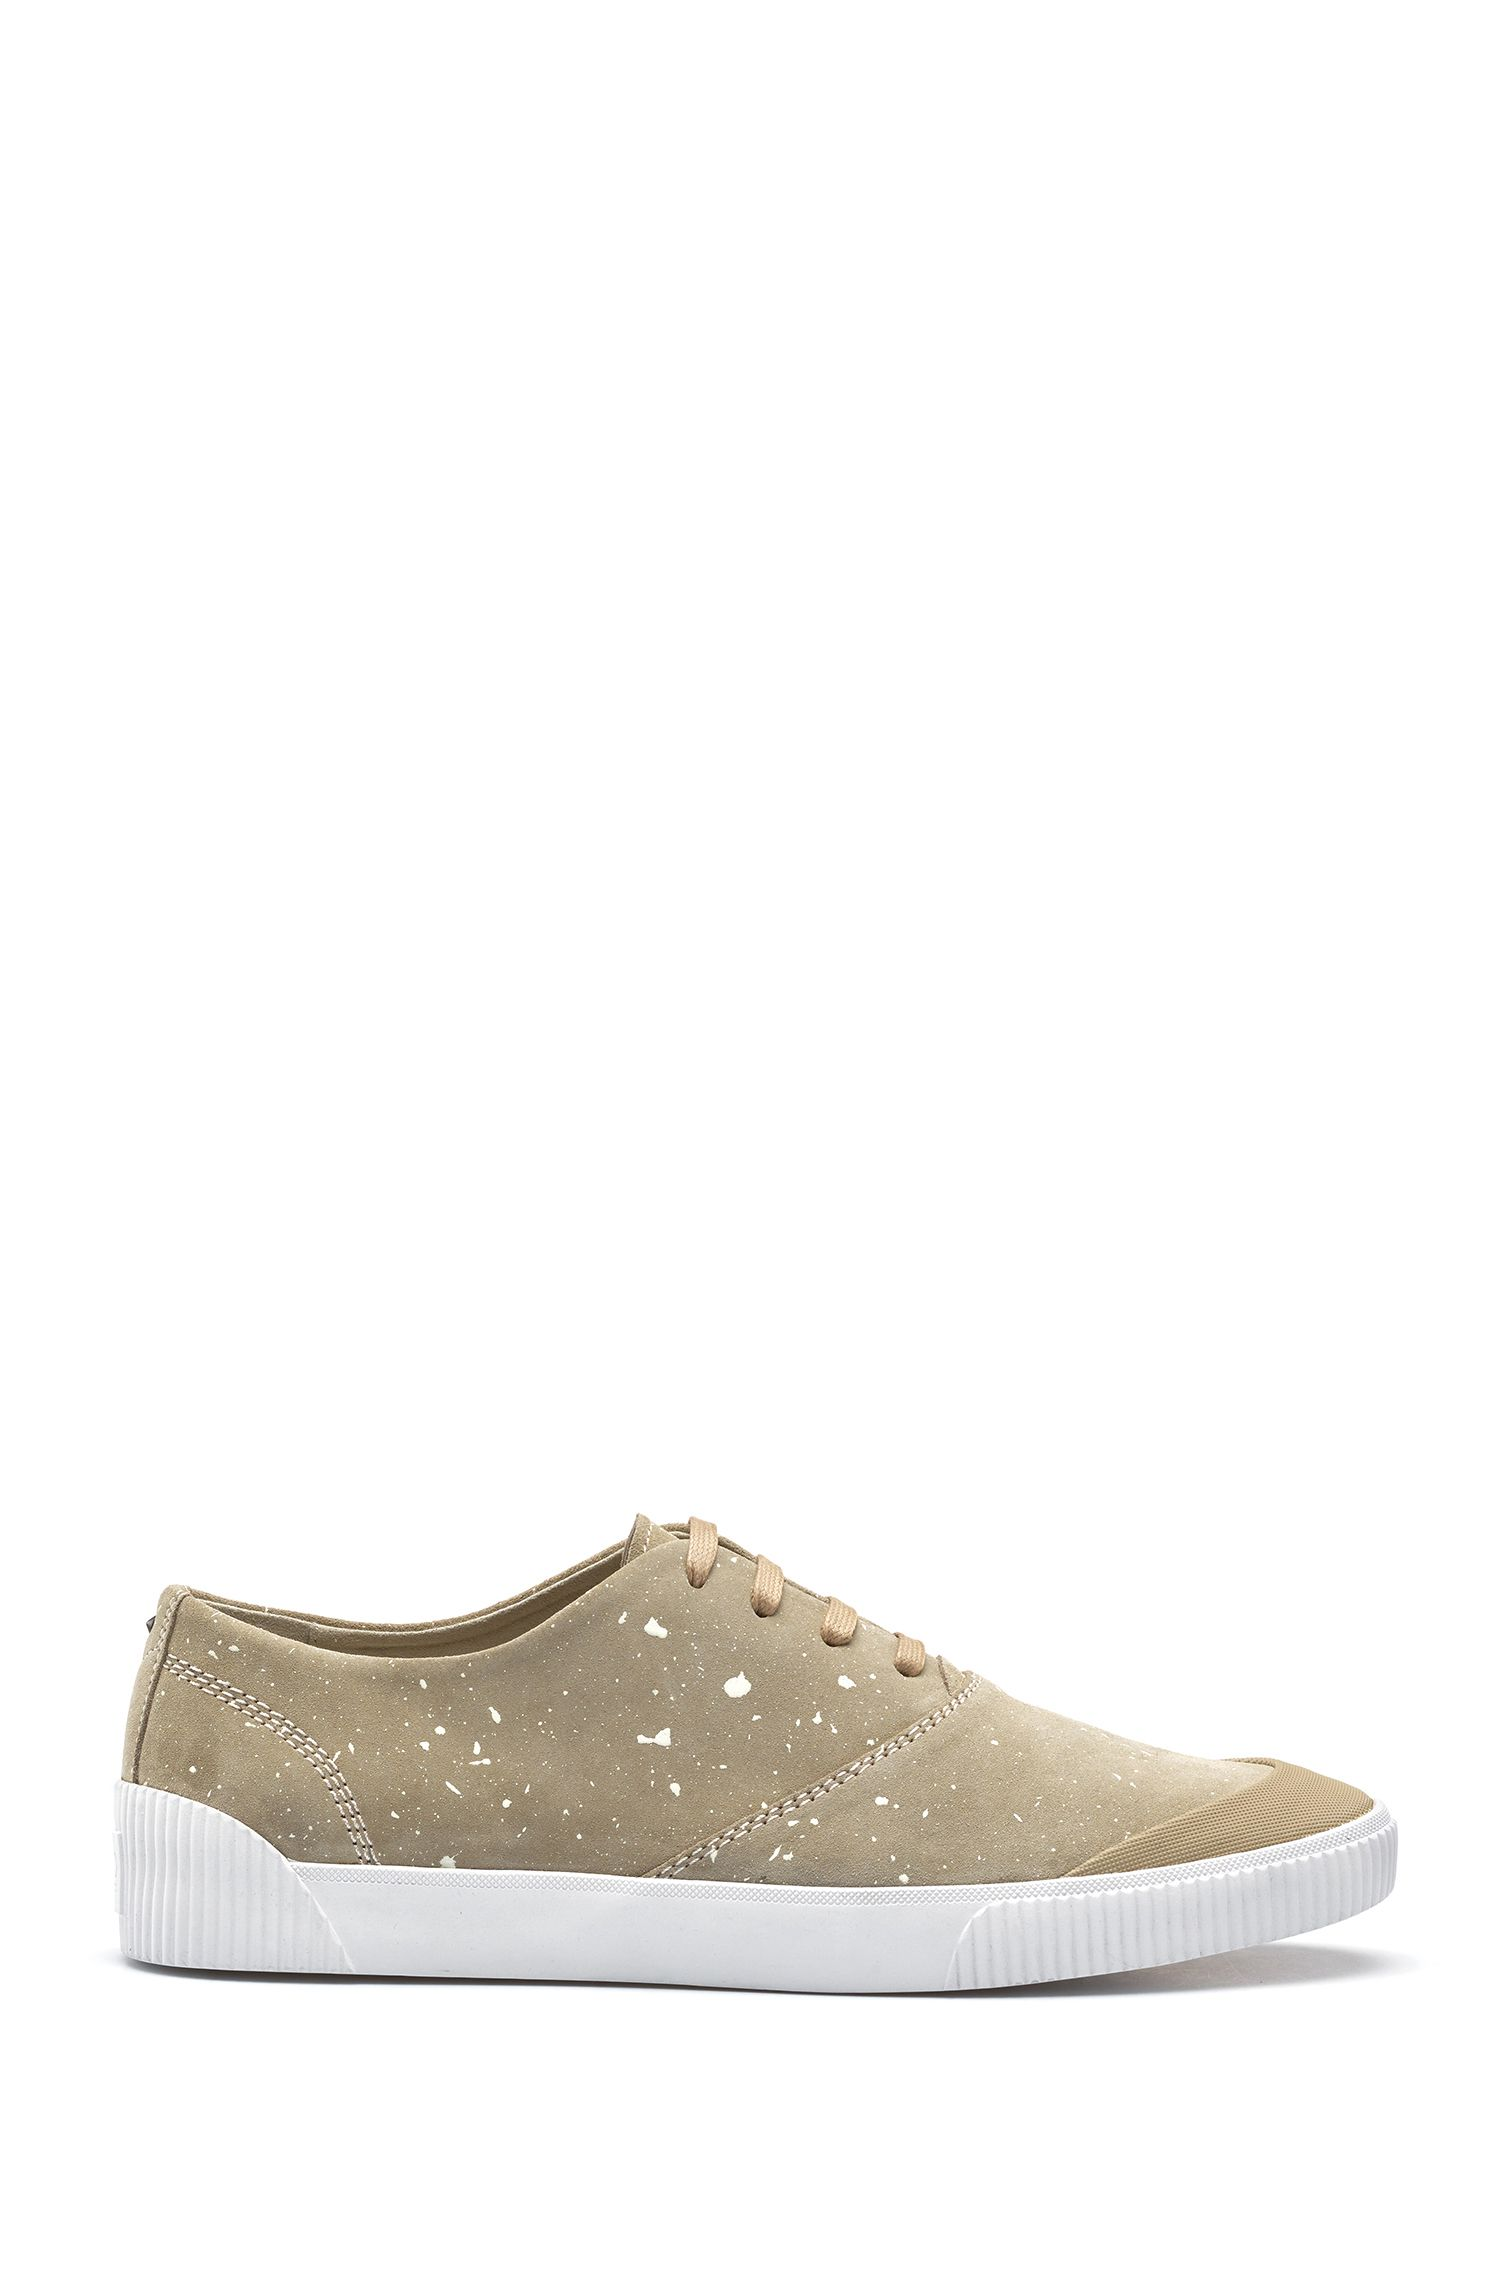 Paint Splattered Suede Tennis Shoe | Zero Tenn